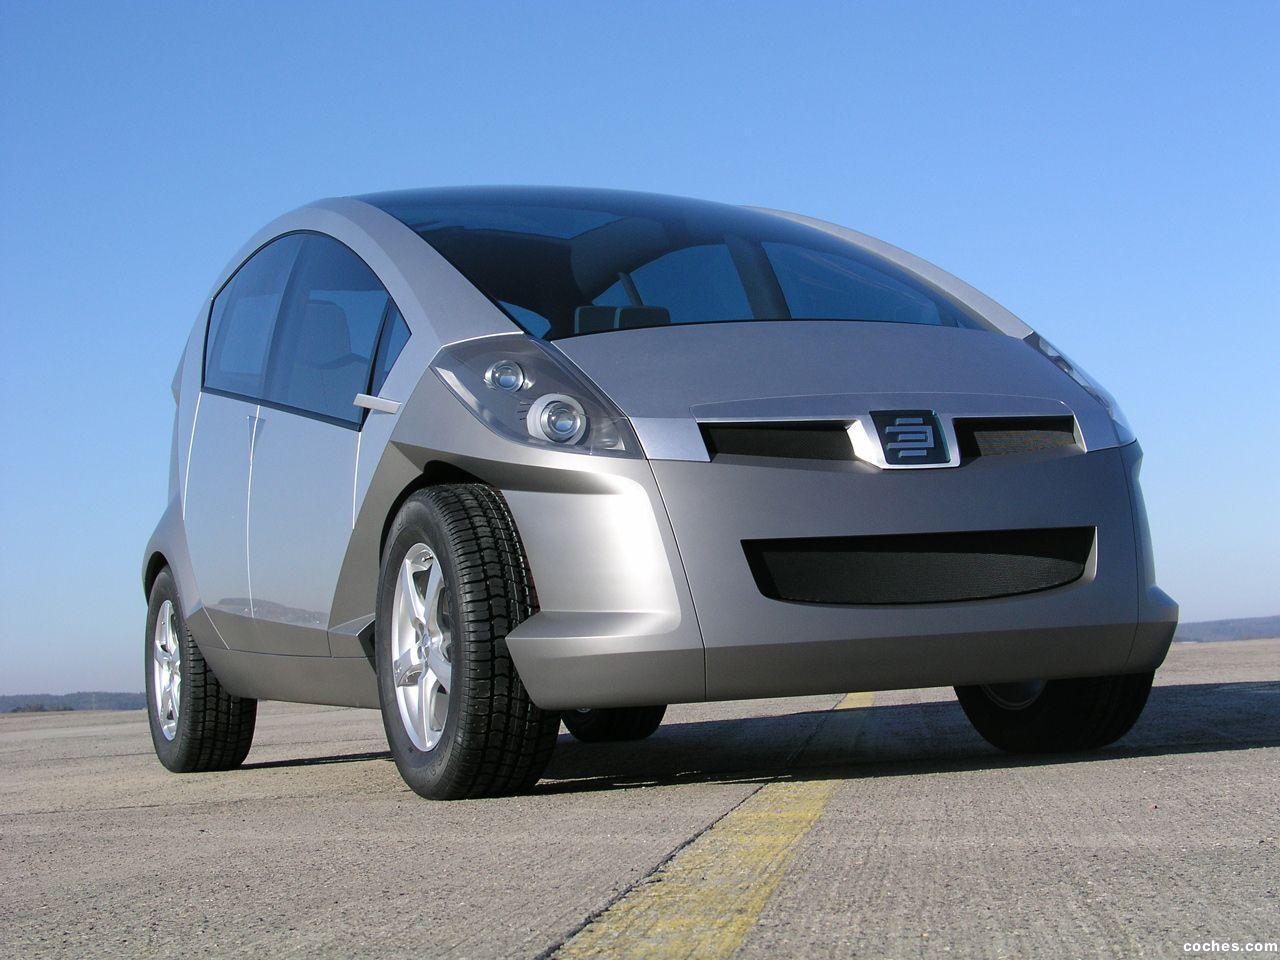 Foto 0 de Edag Cinema 7D Concept Car 2003